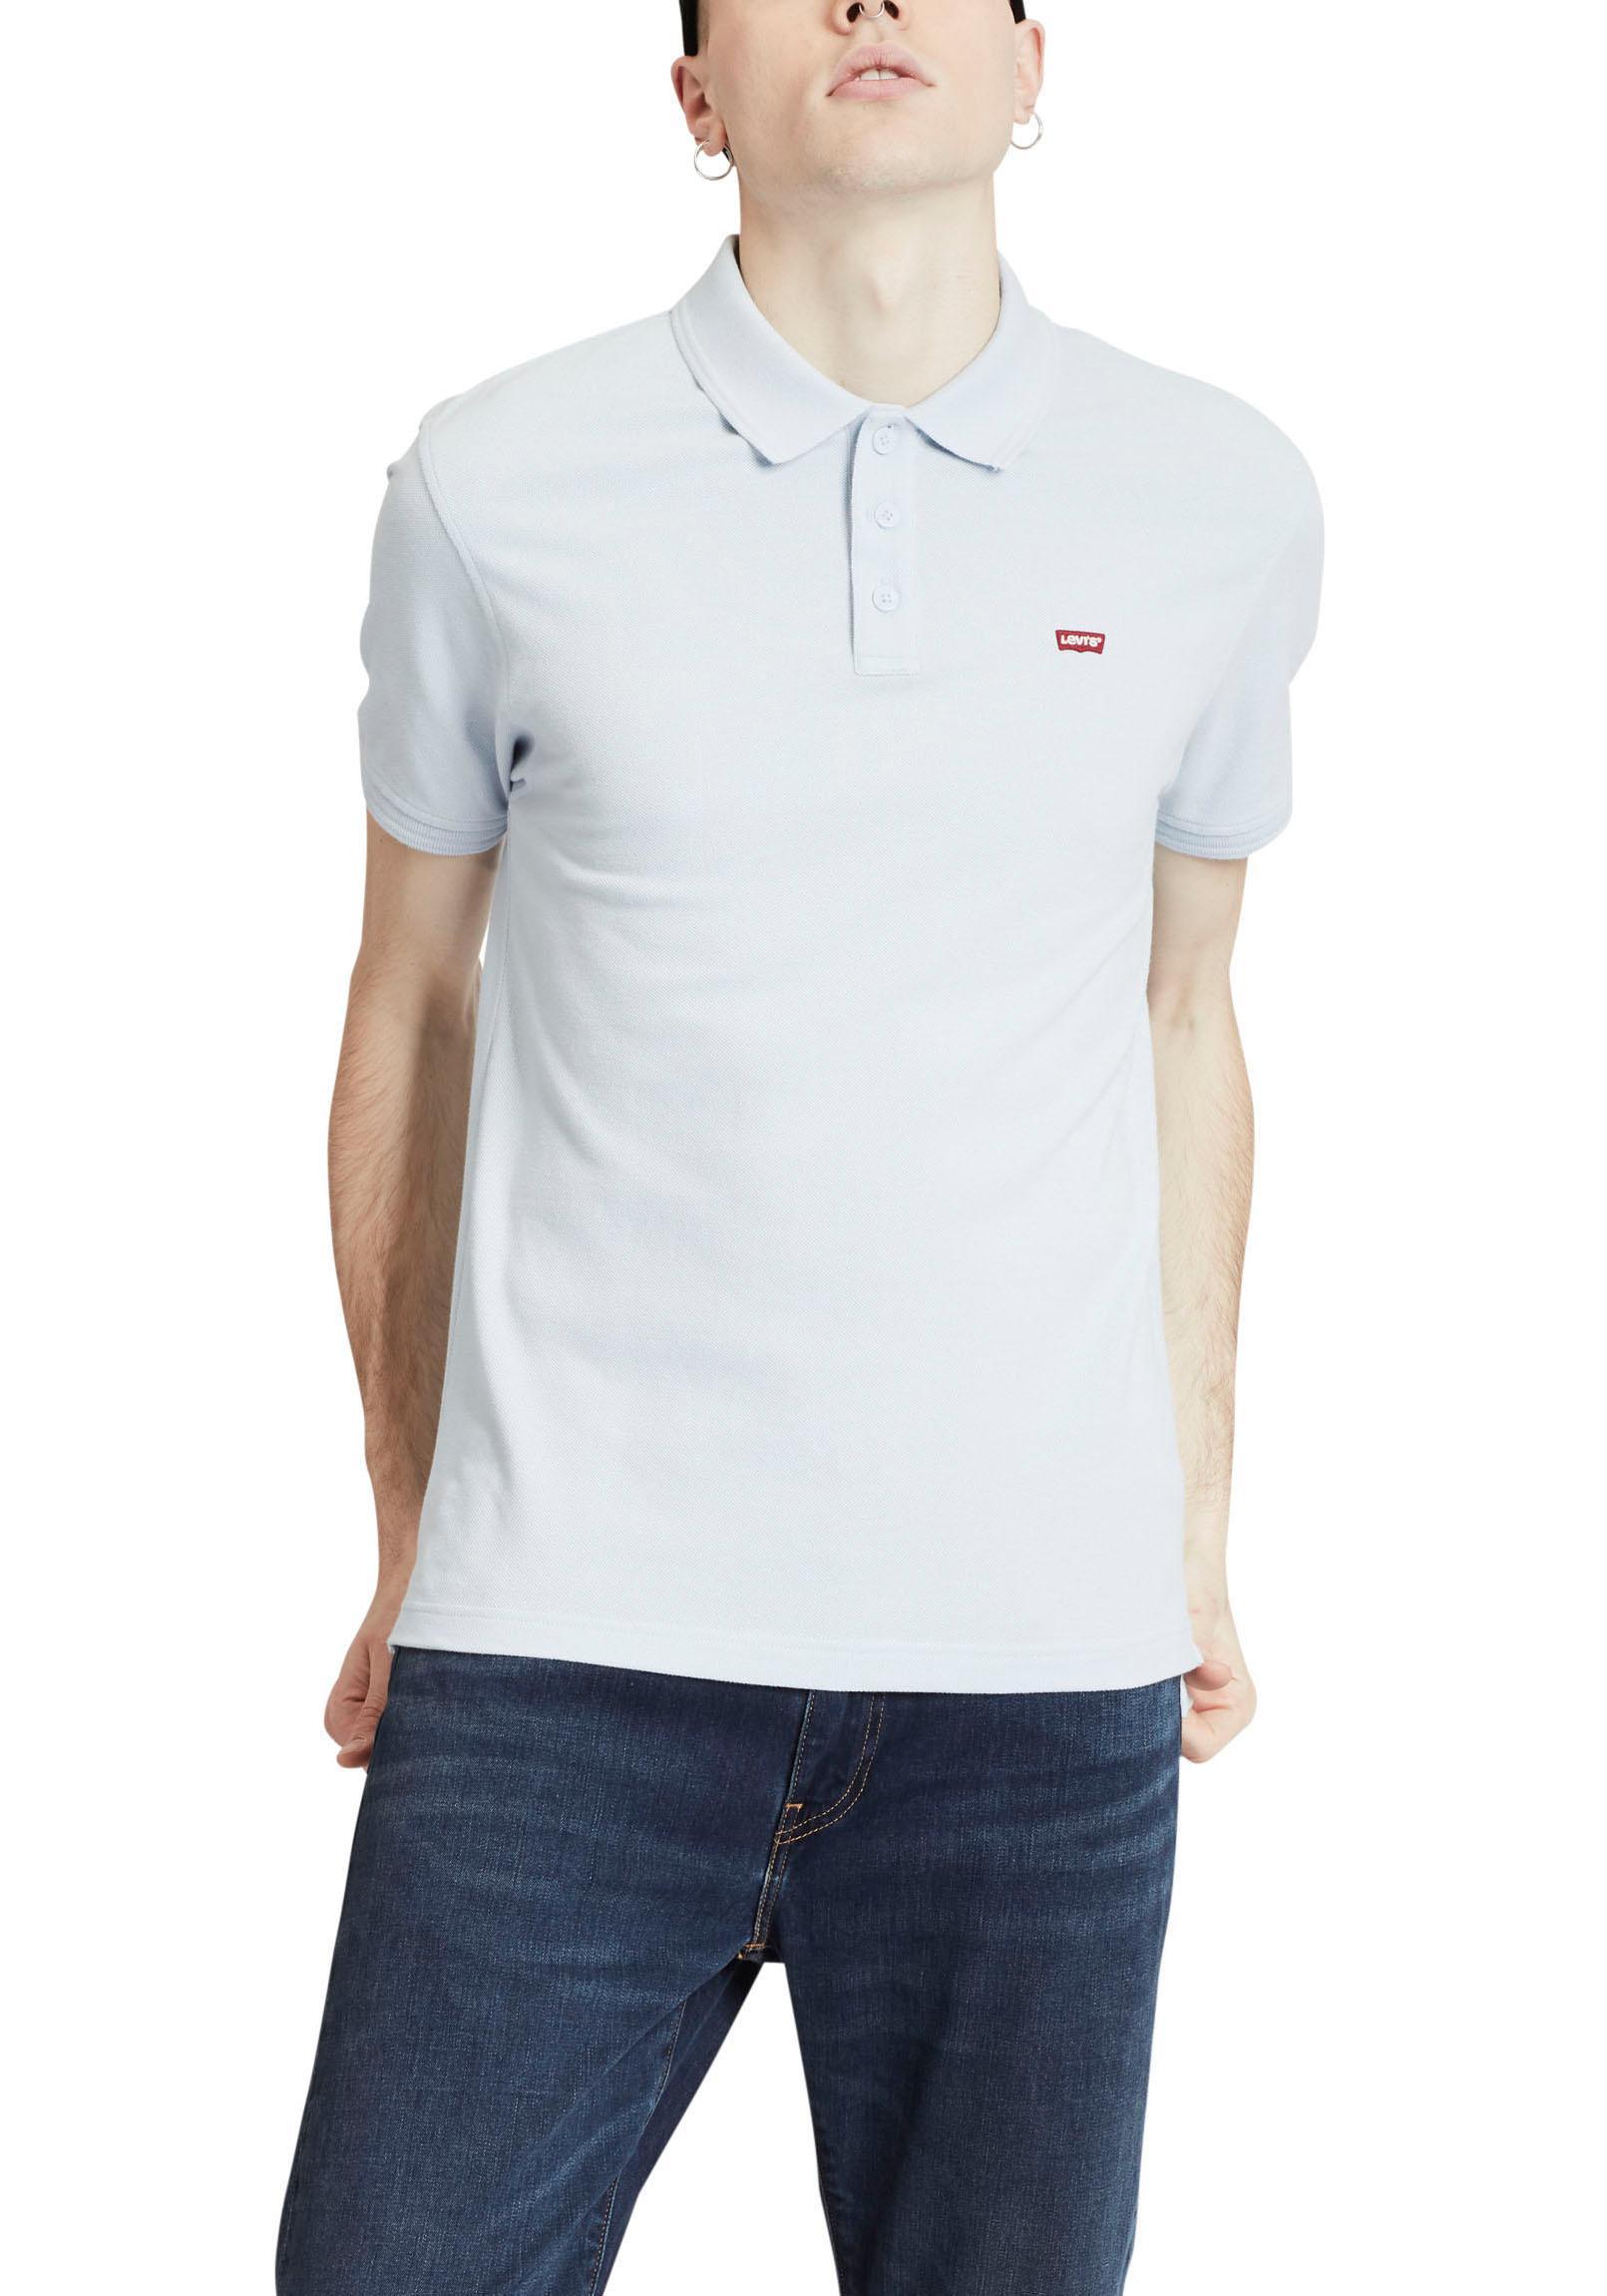 Levi's Poloshirt   Bekleidung > Polo Shirts > Kurzarm   Blau   Levi's